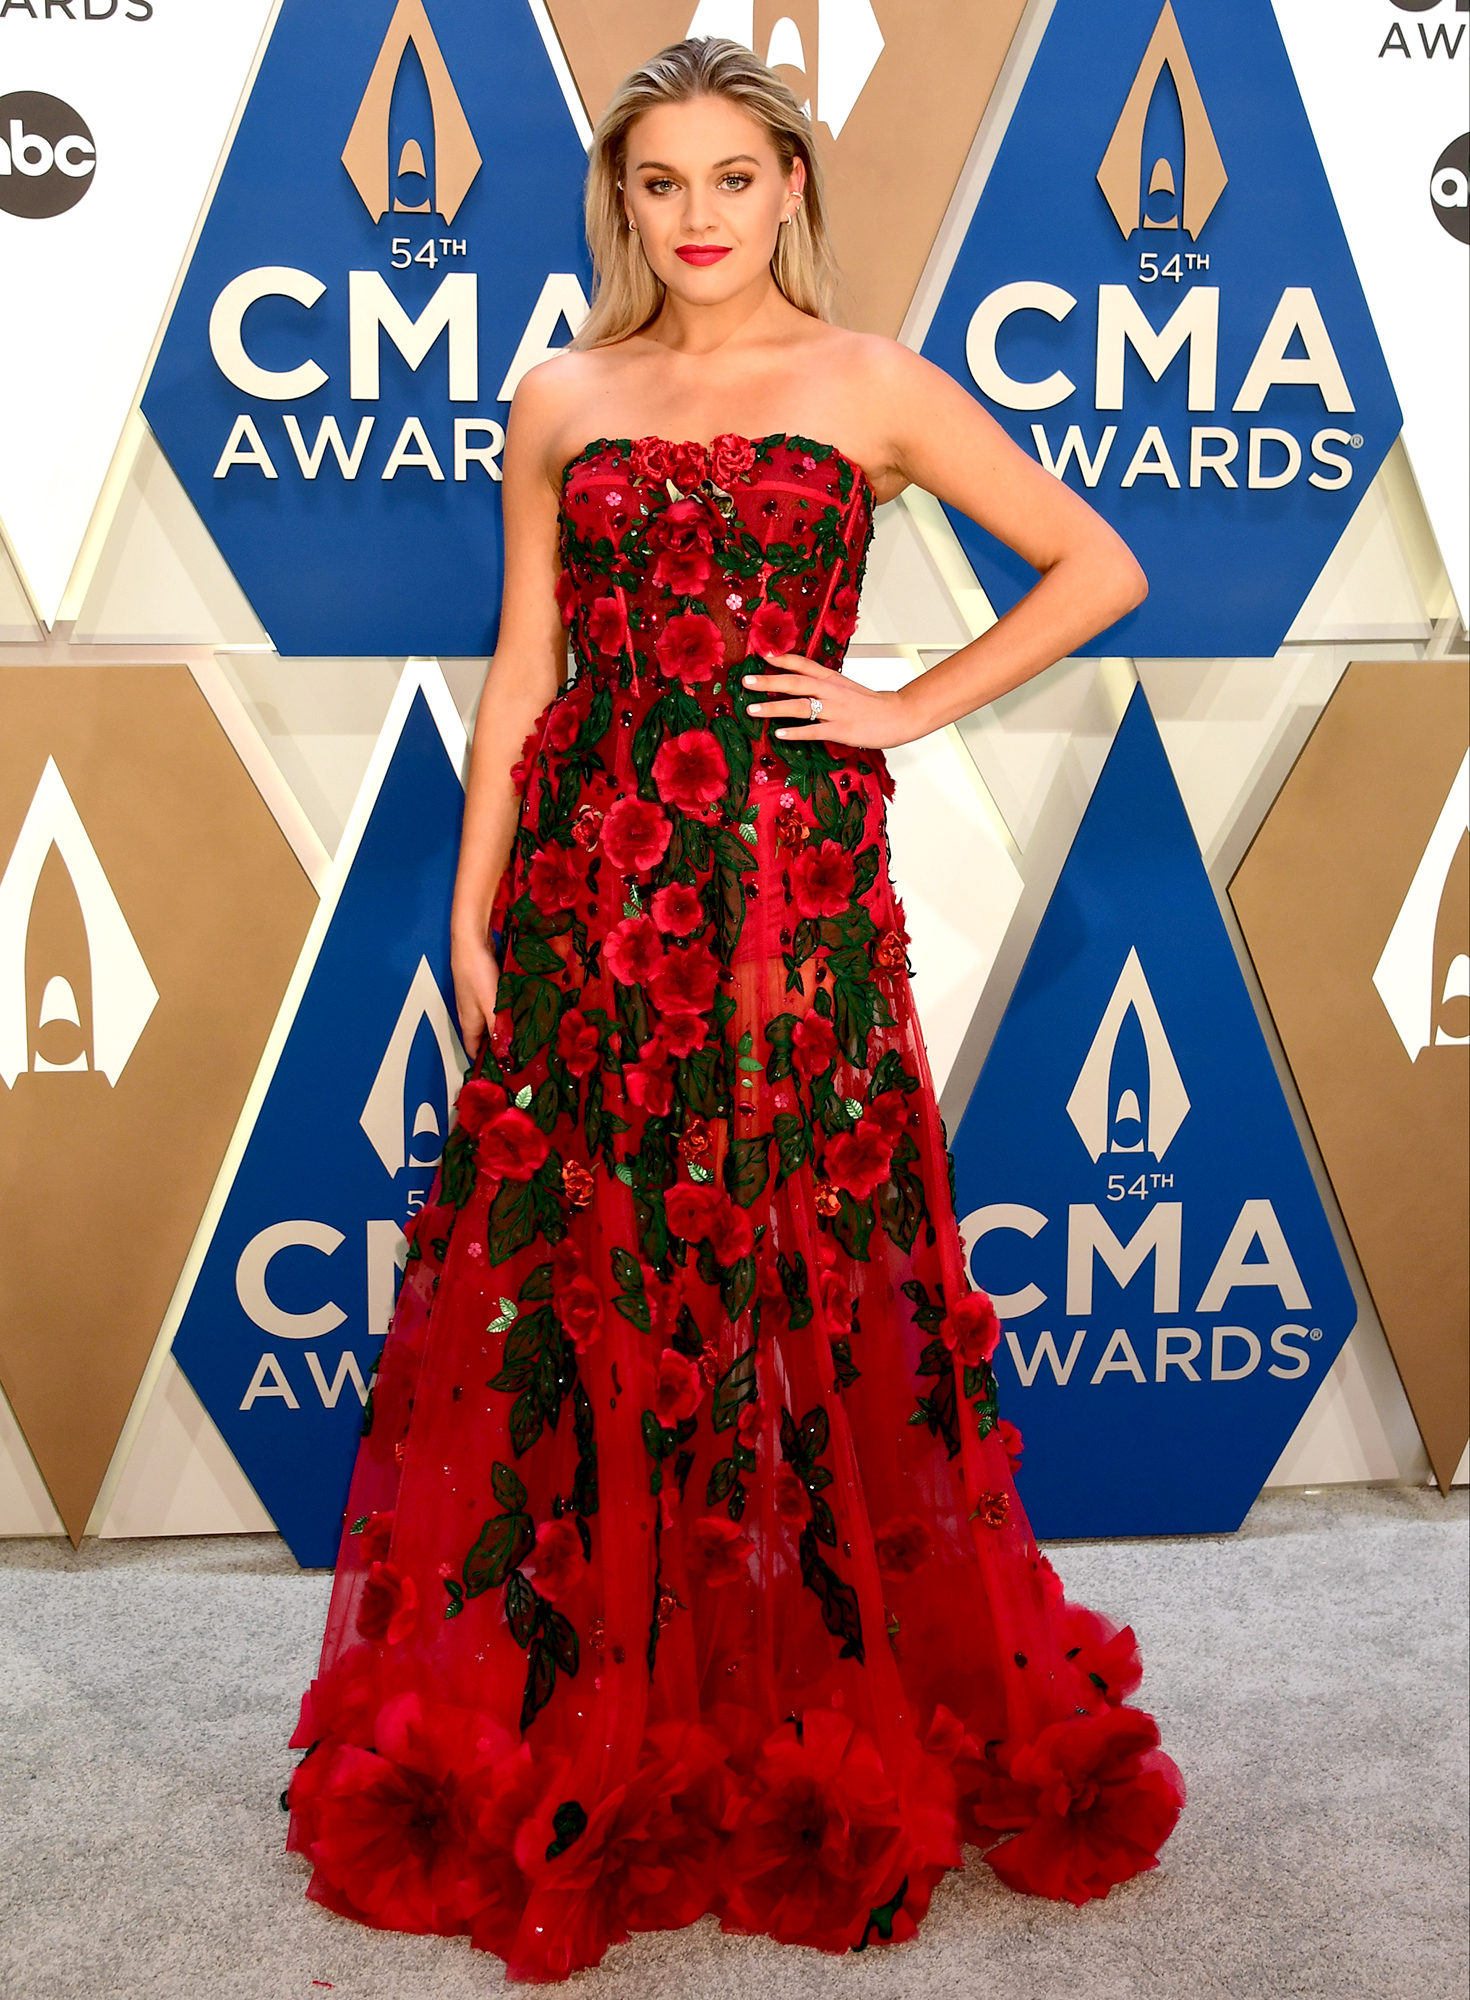 Kelsea Ballerini Slams Incredibly Insensitive Pregnancy Rumors Following 2020 CMA Awards